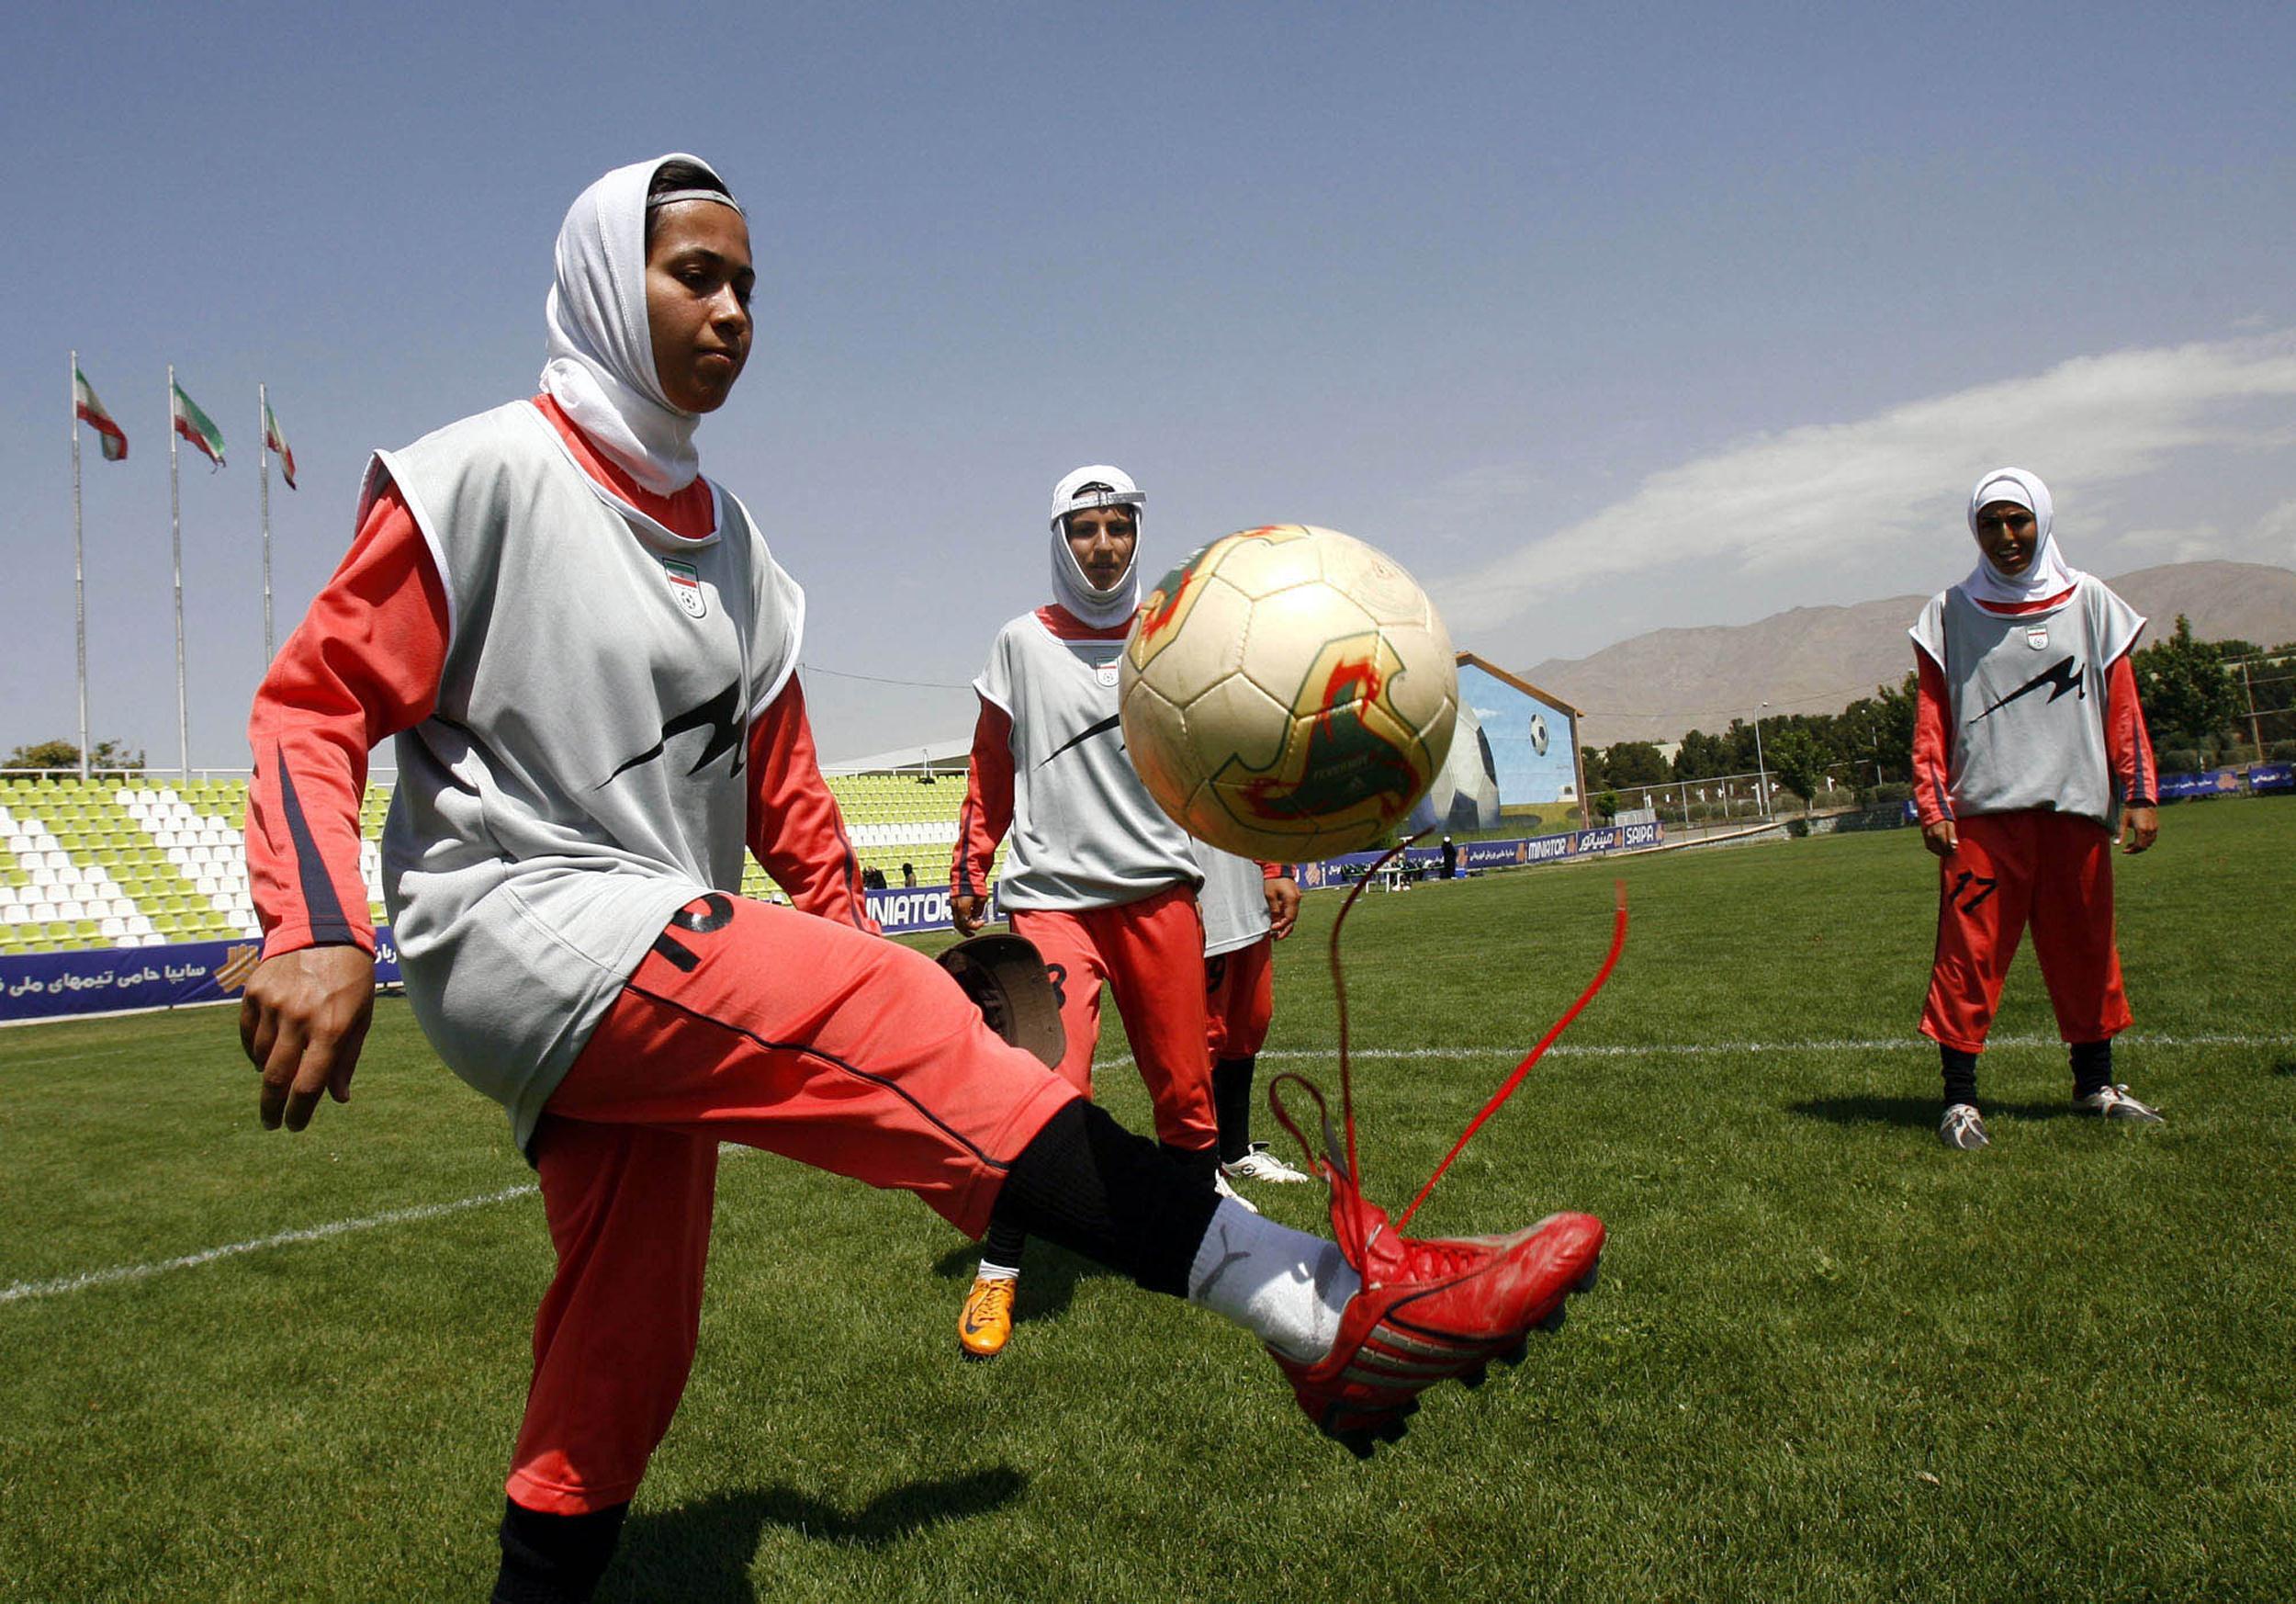 Image: Iranian female soccer players